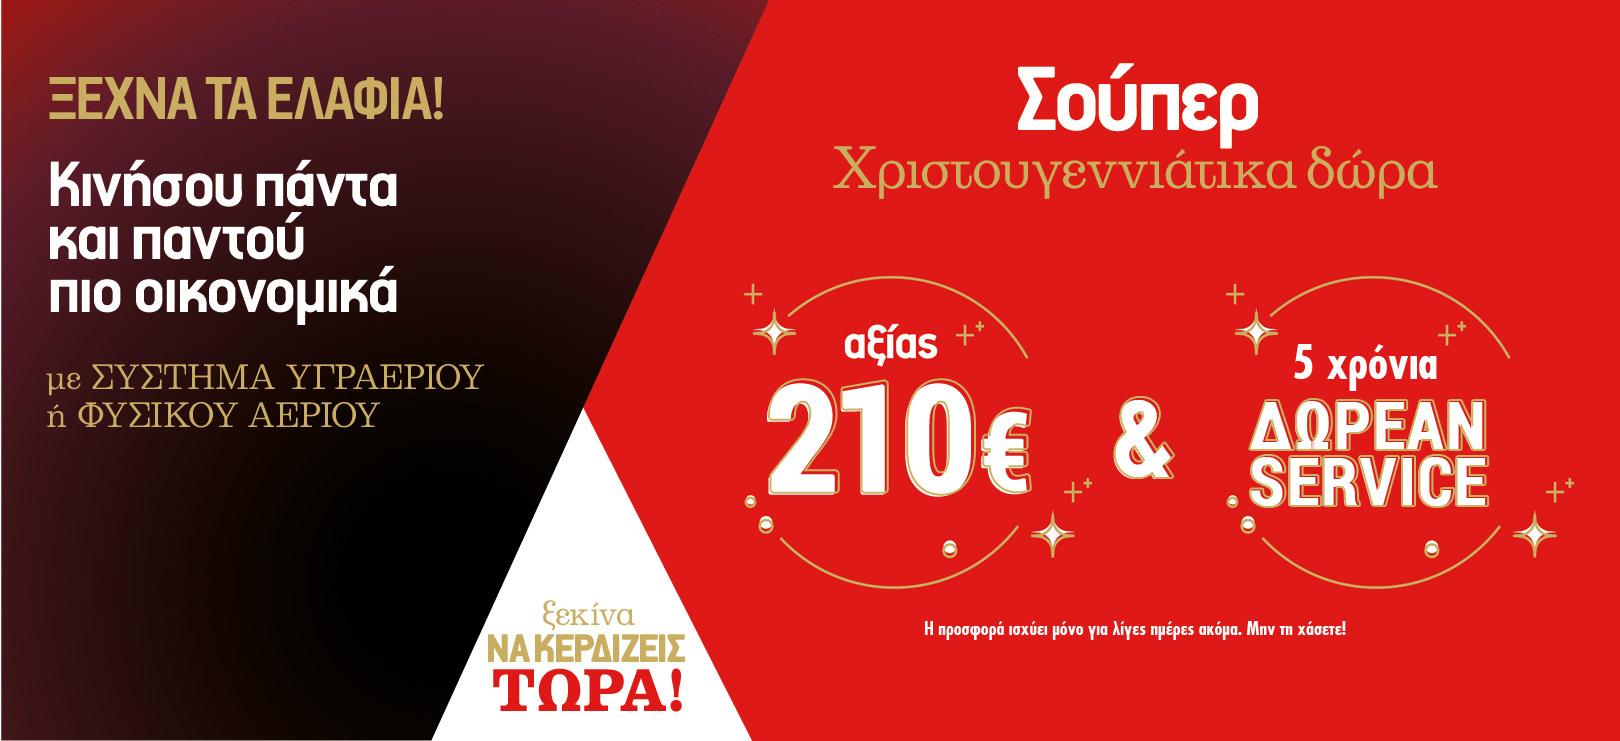 banner_1620x740_02-5xronia-service